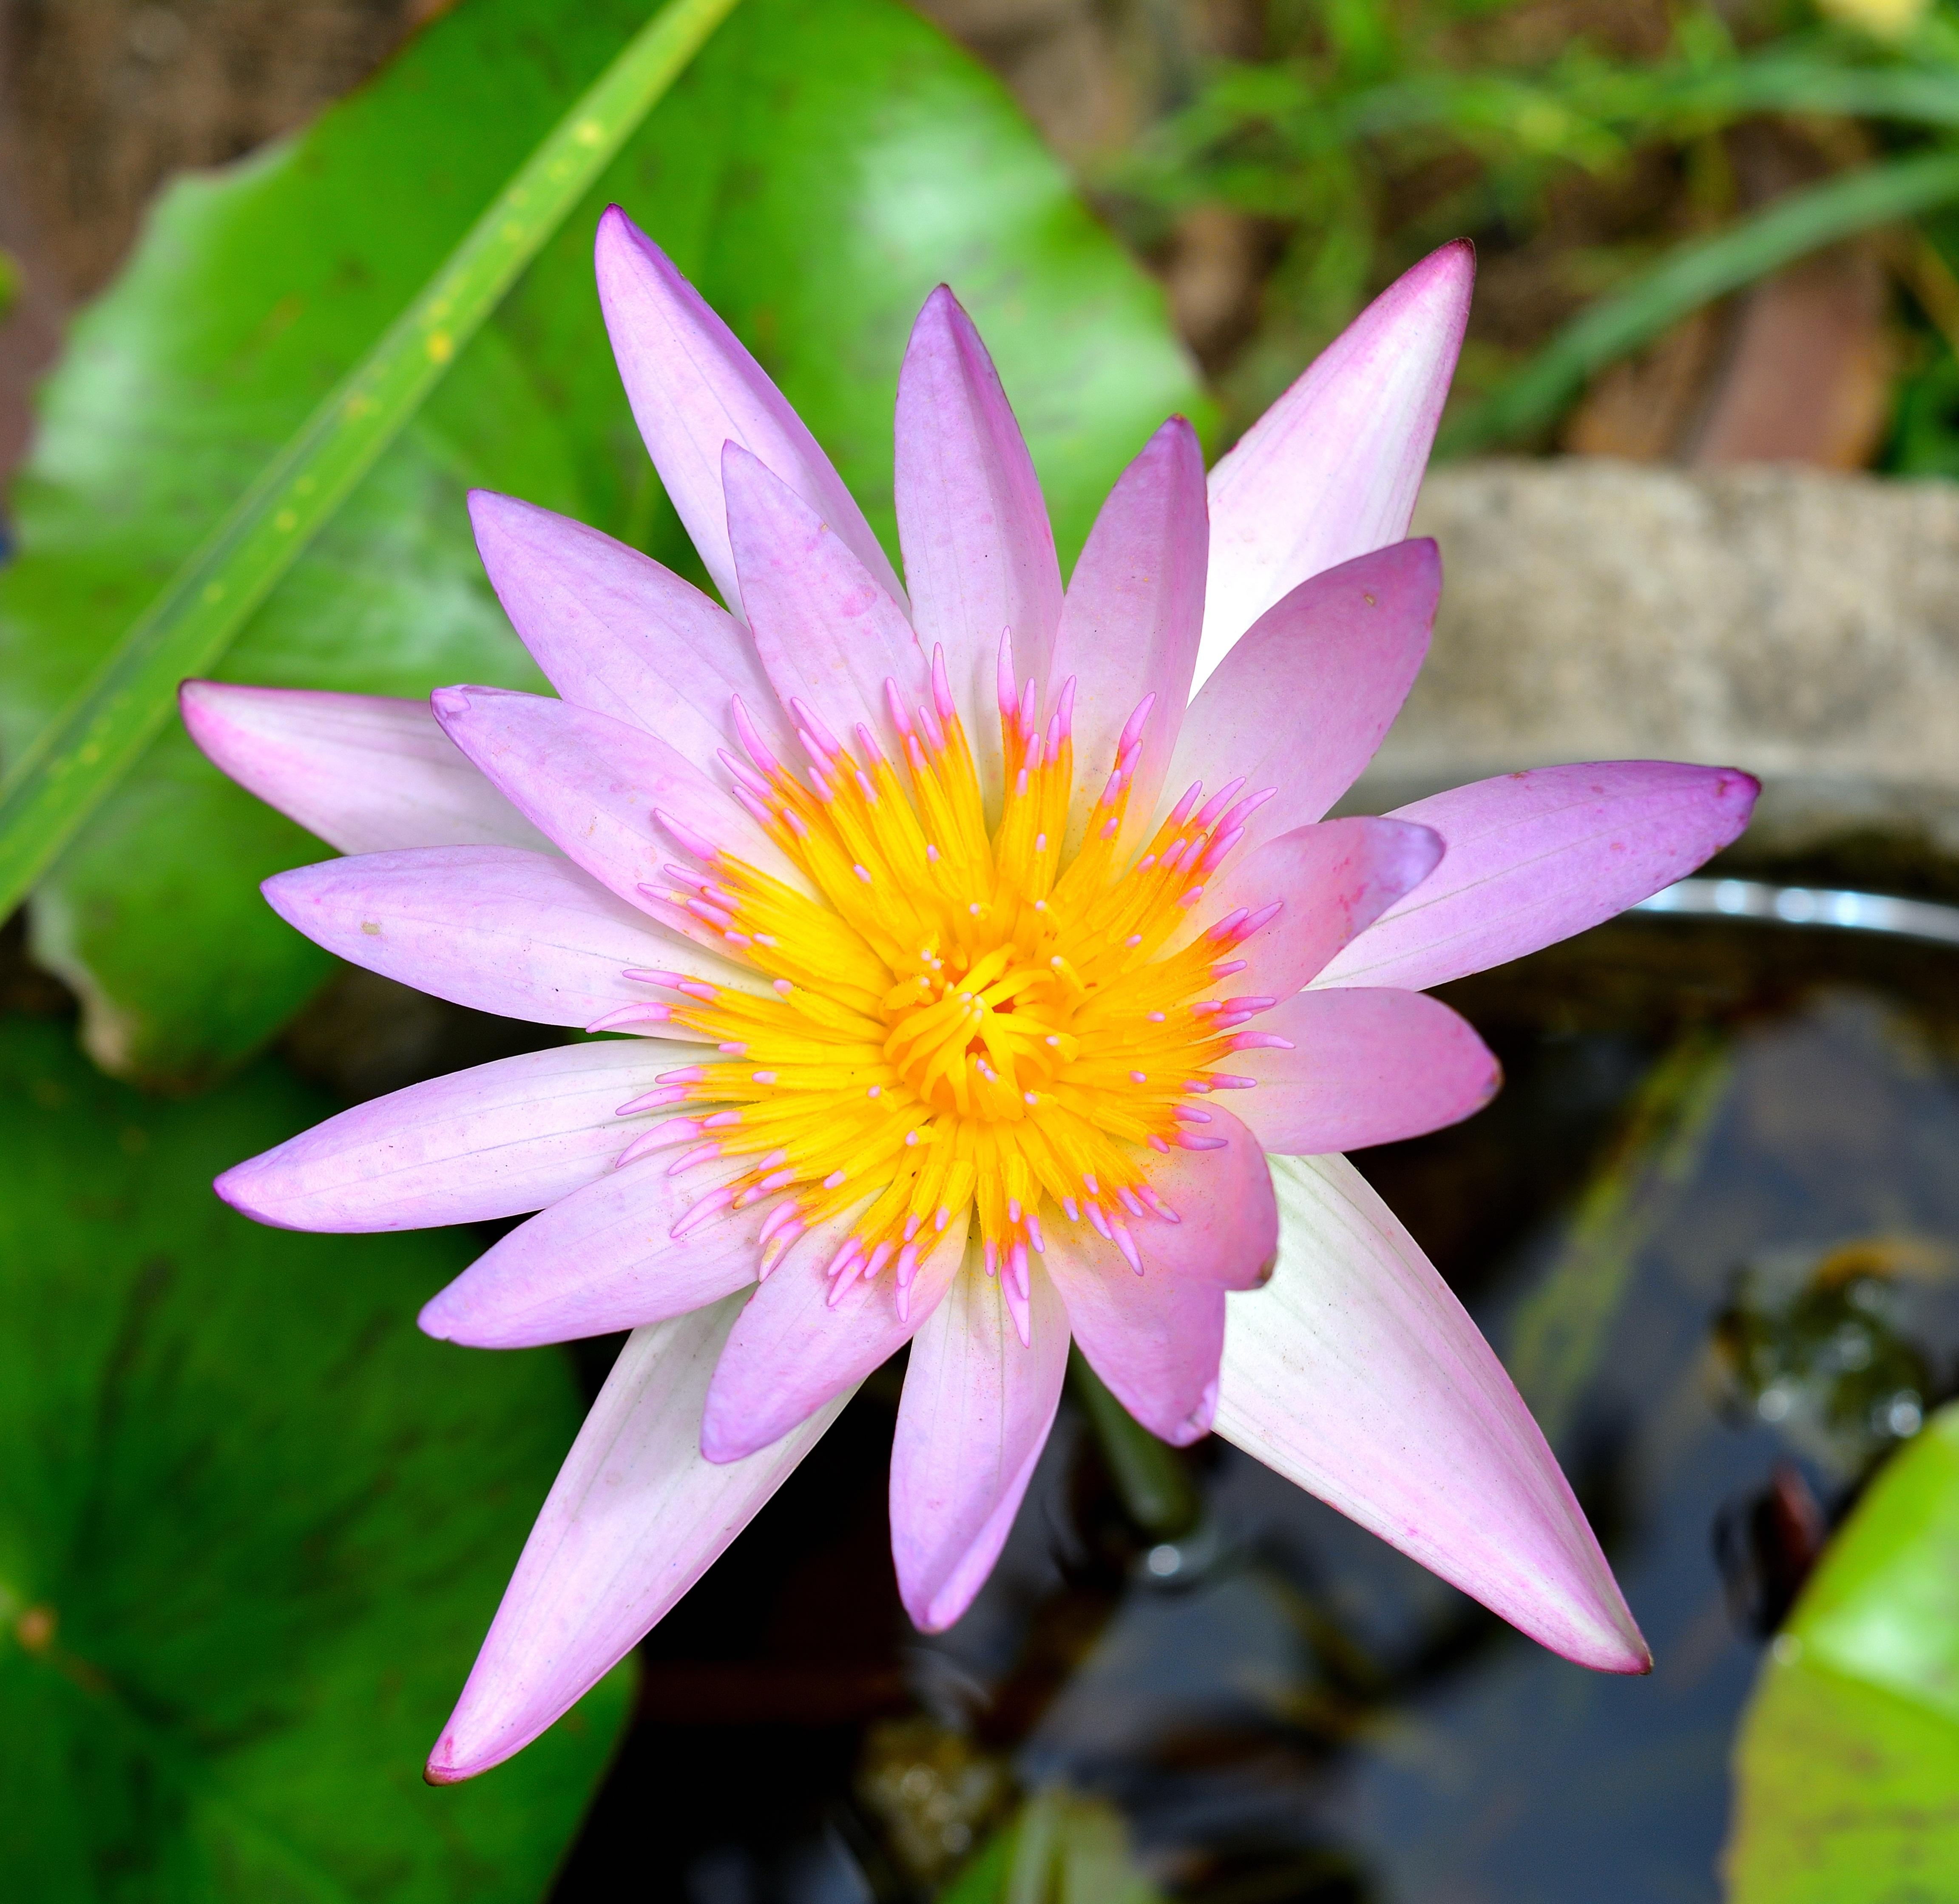 Free Images Nature Blossom Flower Purple Petal Green Botany